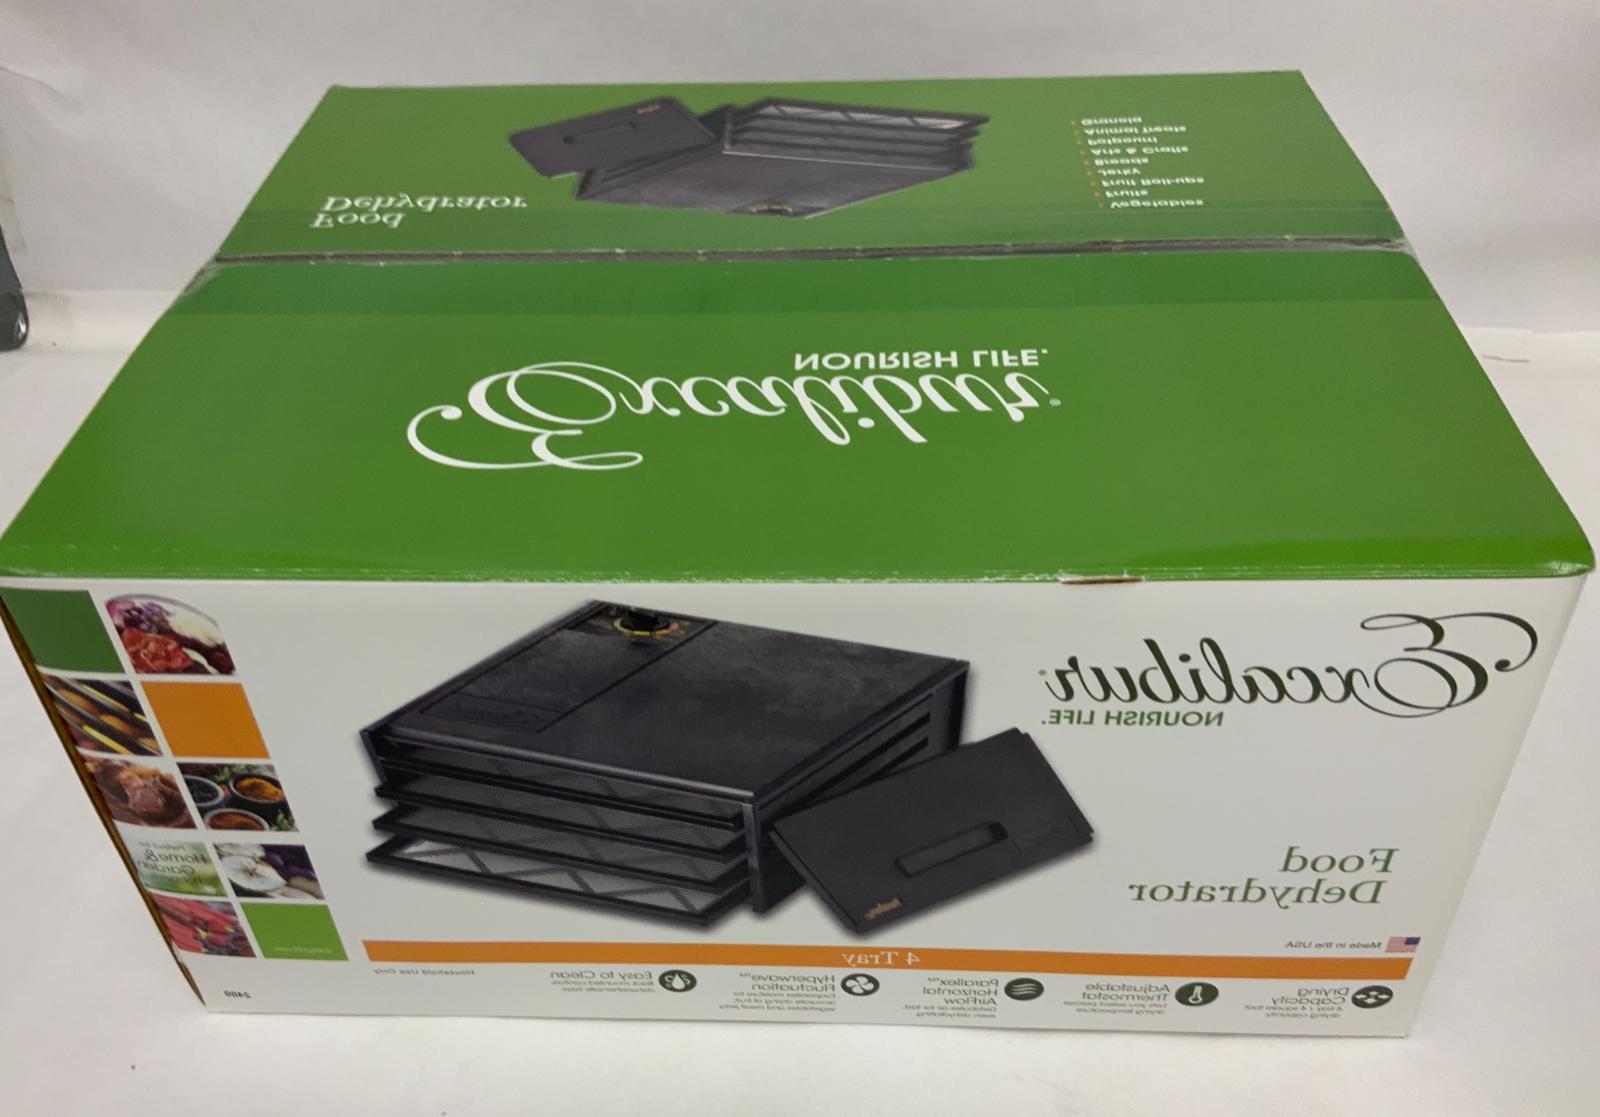 2400 4 tray food dehydrator with adjustable